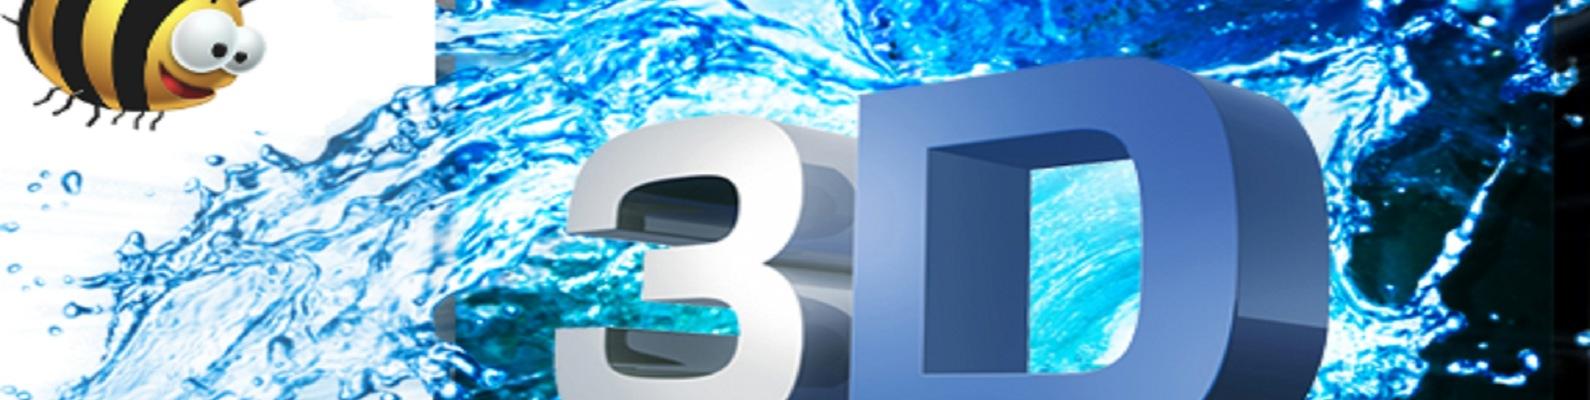 3d фильмы онлайн sbs